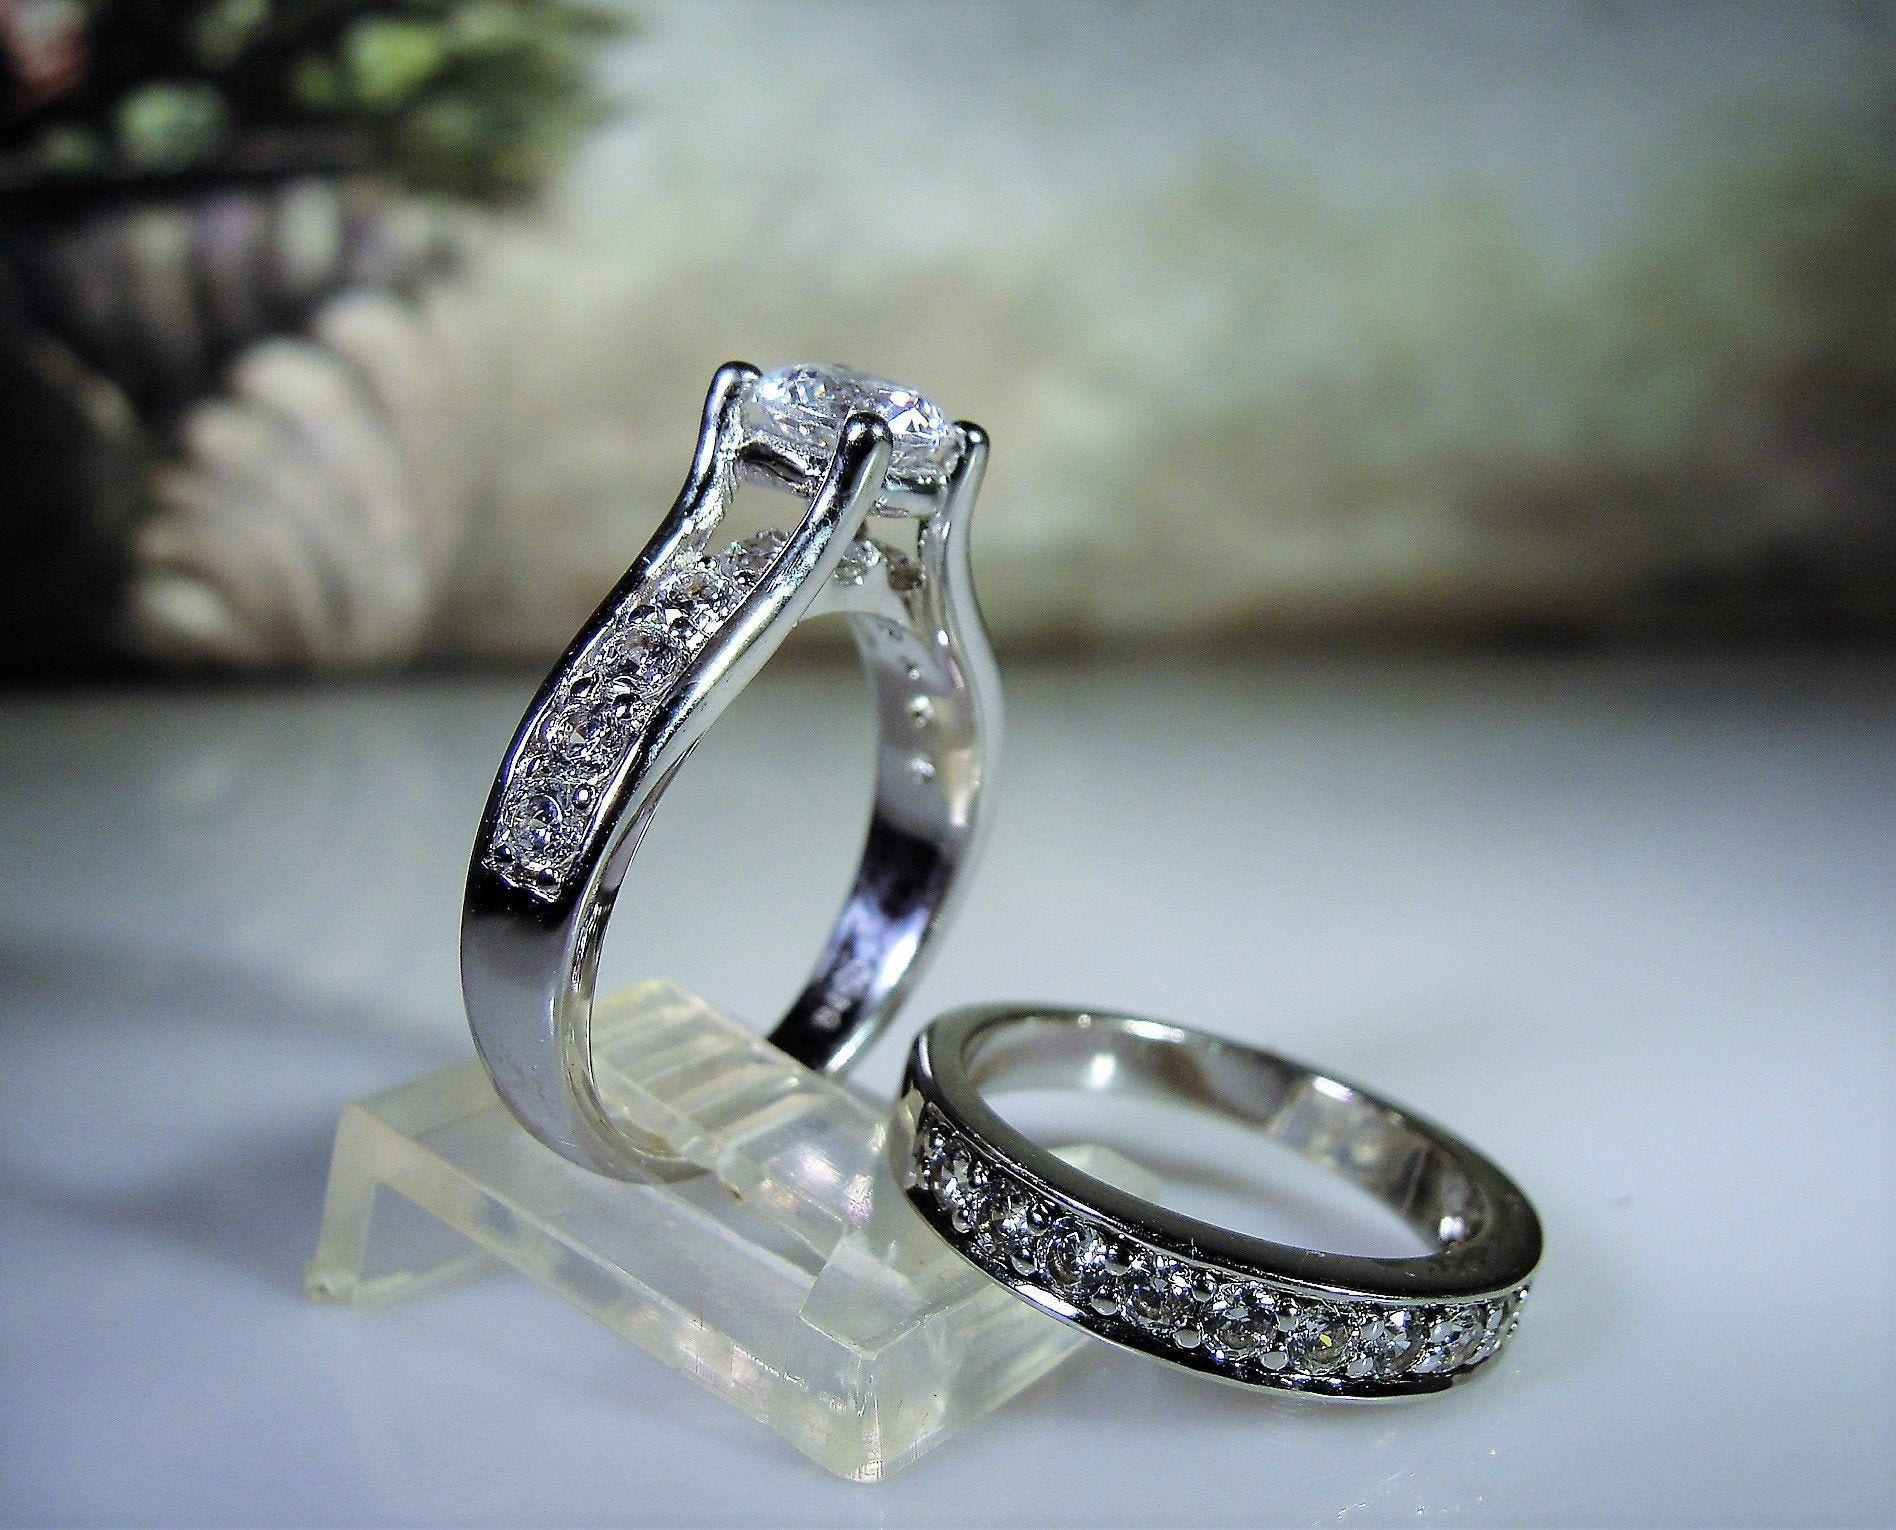 Sterling Silver Bridal Ring Set Cz Ring Set Engagement Ring Wedding Band Travel Rings Weddin In 2020 Wedding Ring Bands Wedding Ring Sets Unique Wedding Ring Sets